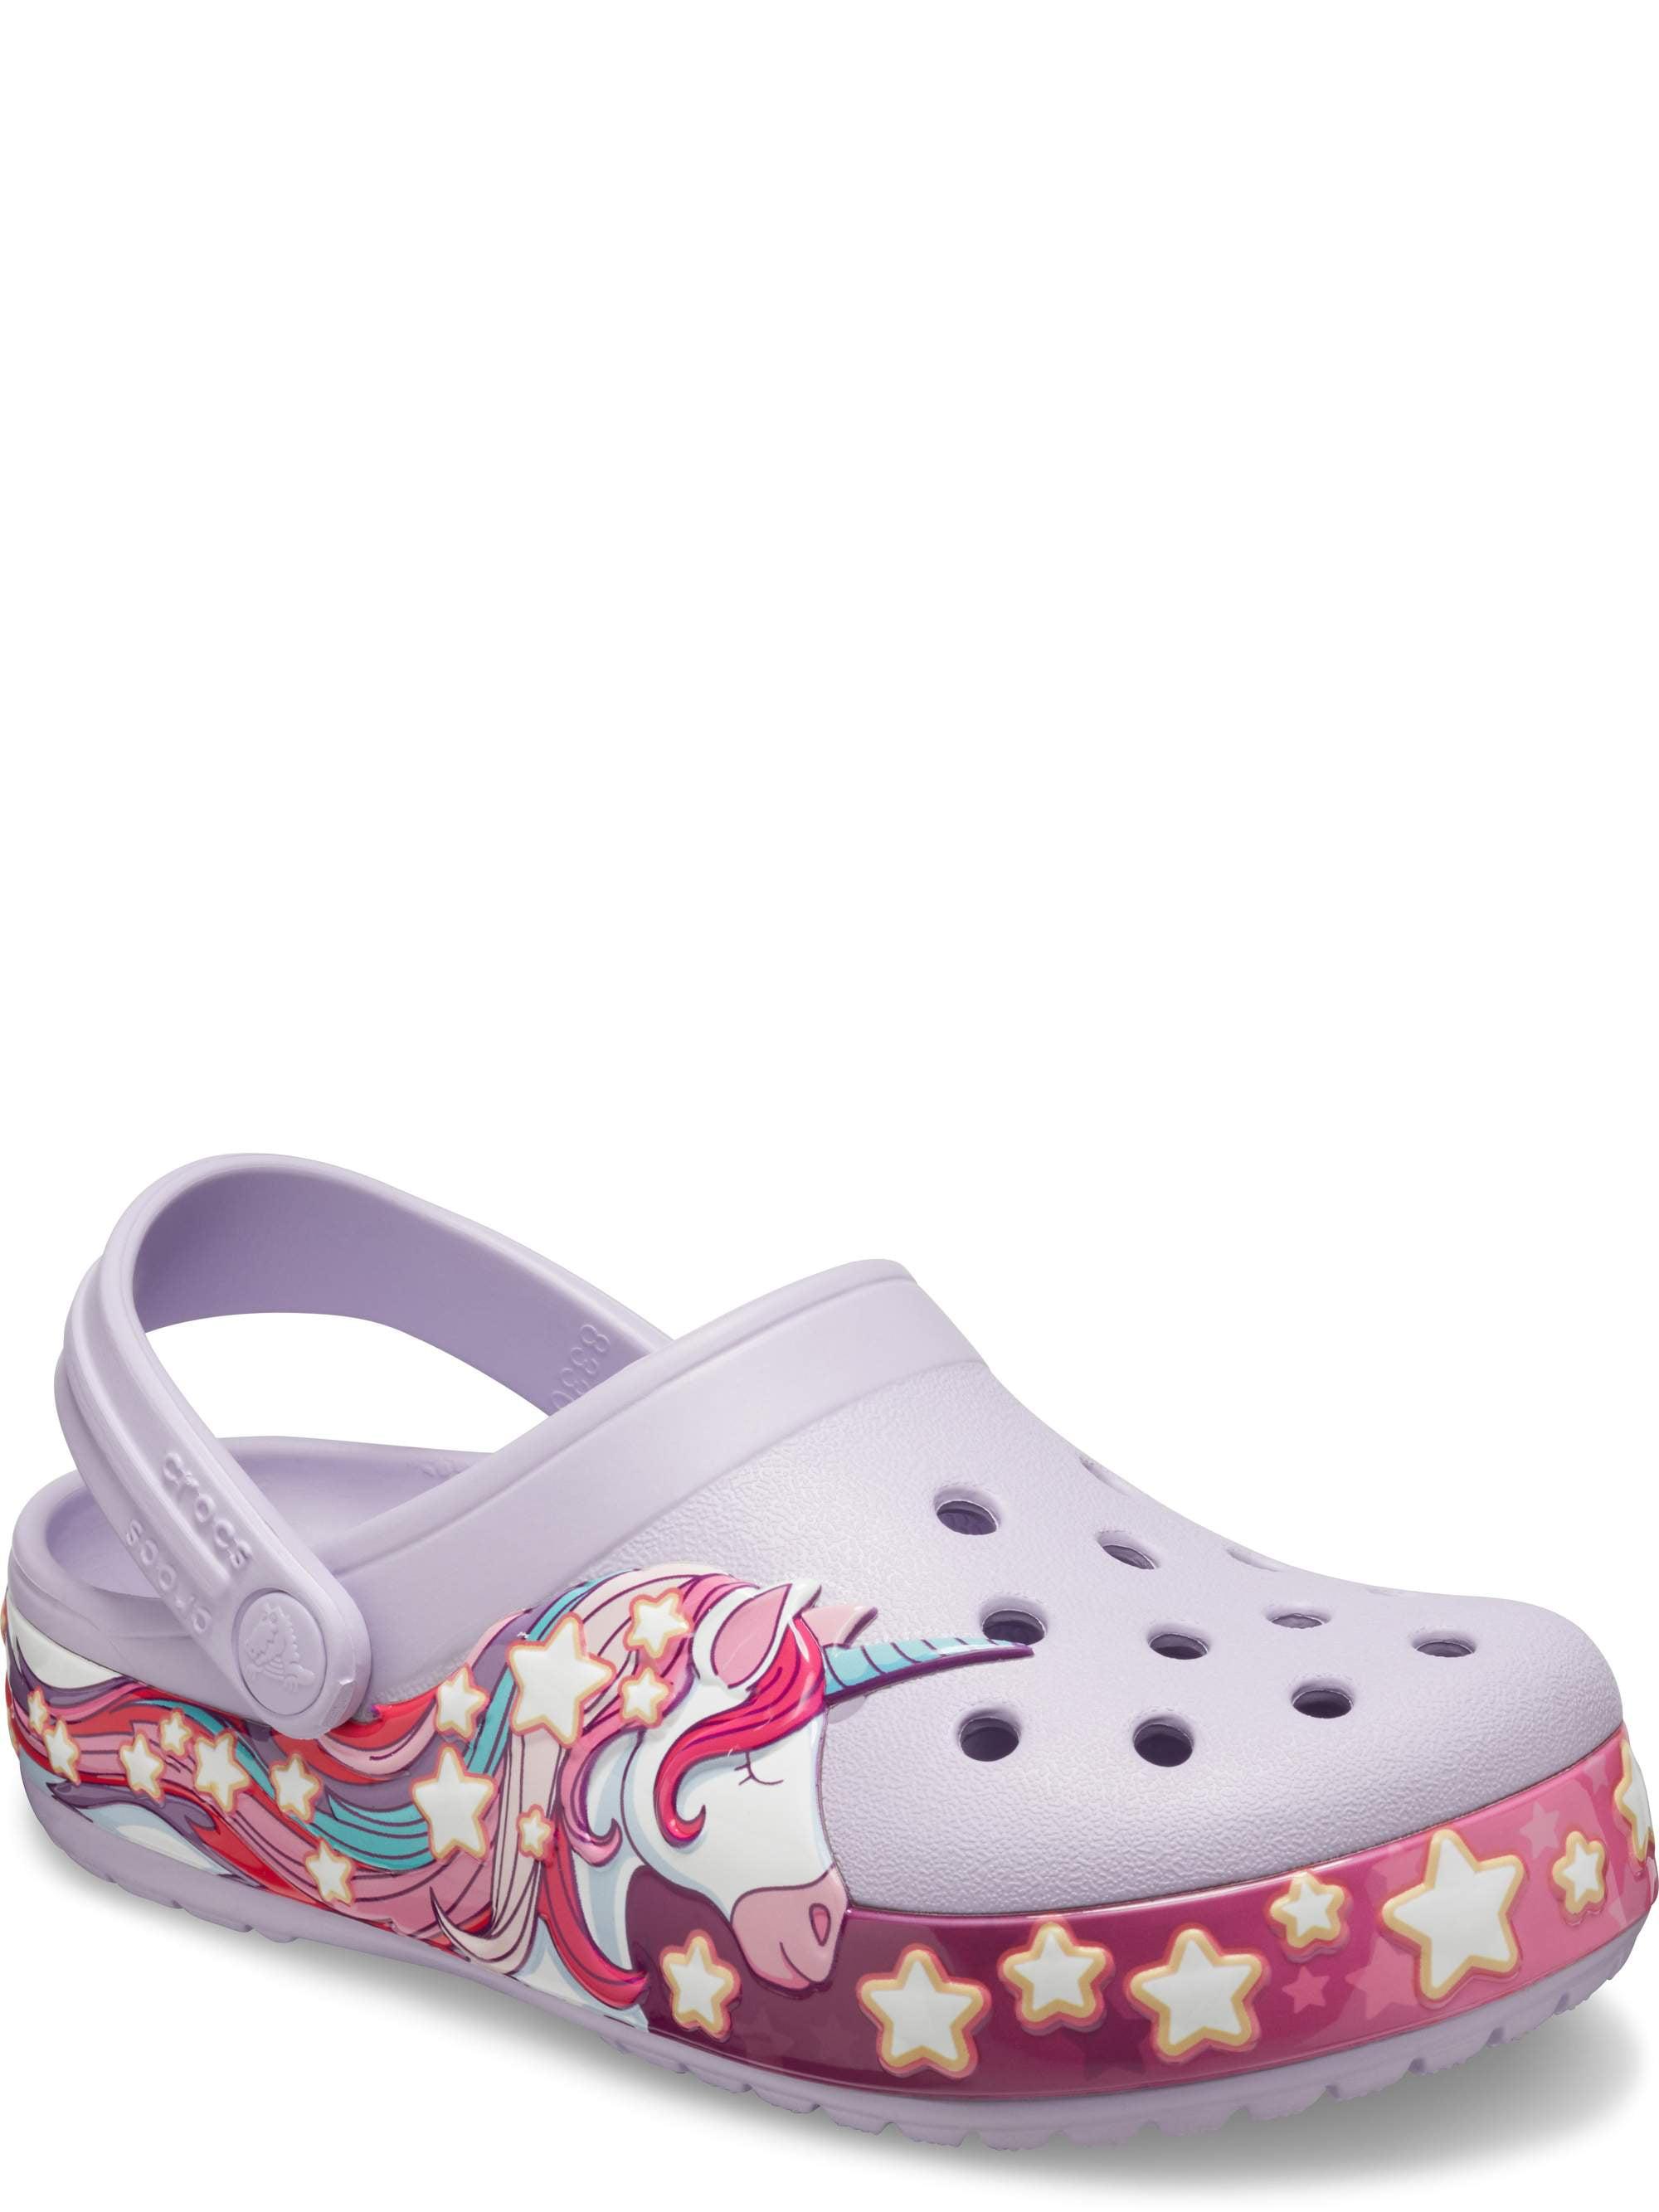 Crocs Child FunLab Unicorn Band Clogs